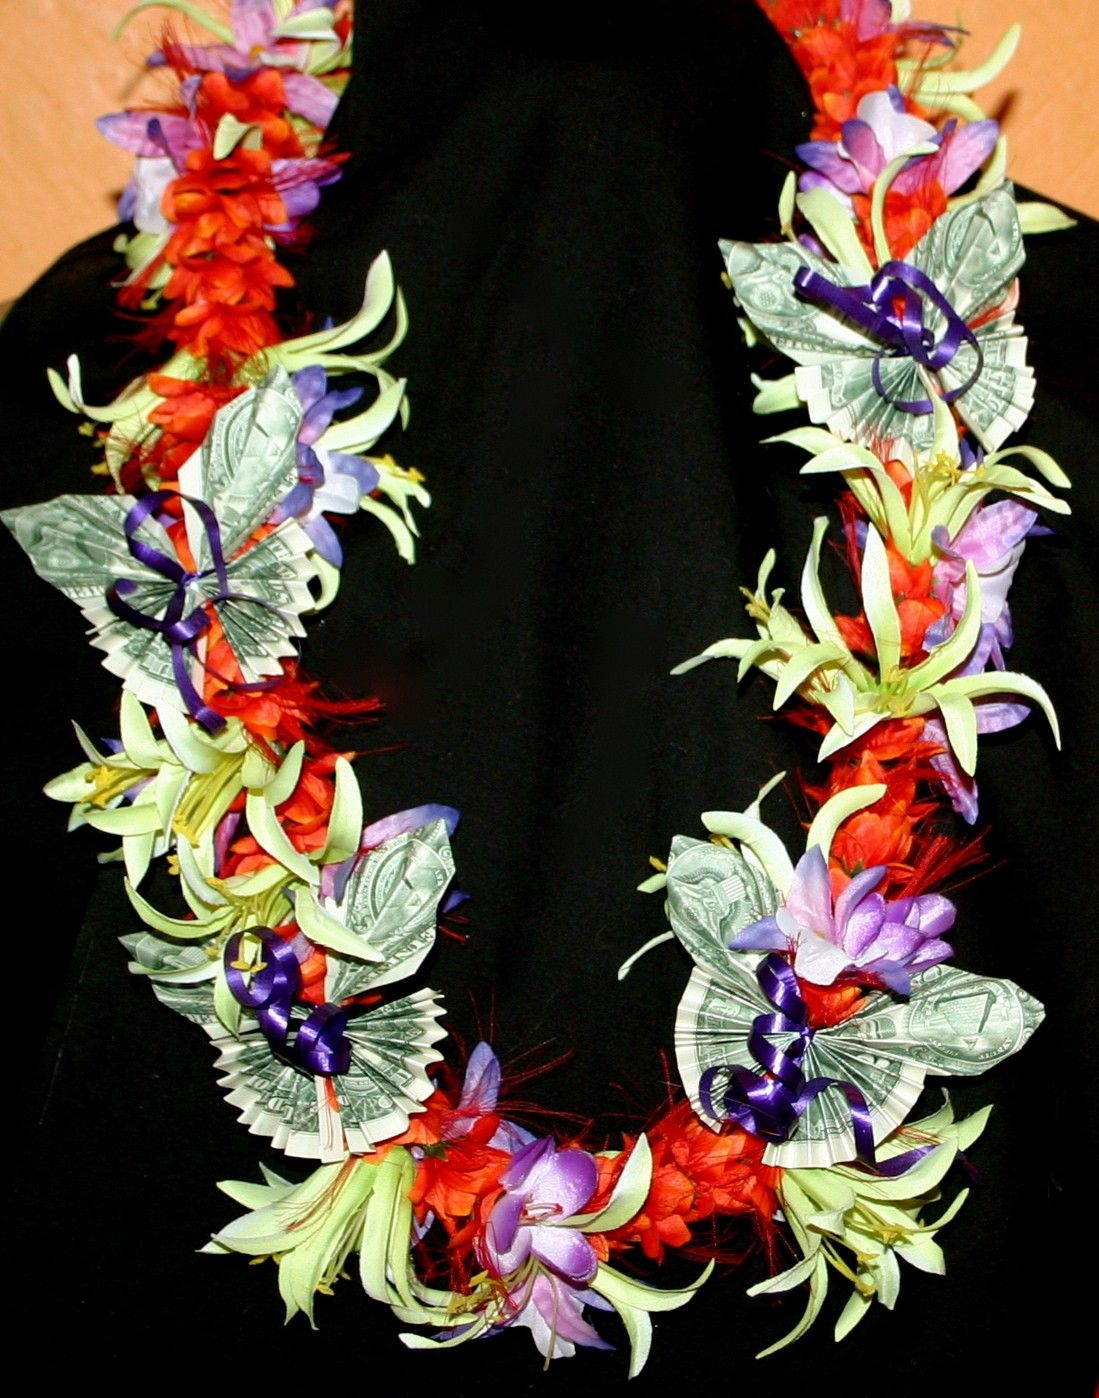 Hawaiian silk flower money lei 3600 via etsy hawaiian leis hawaiian silk flower money lei 3600 via etsy mightylinksfo Image collections